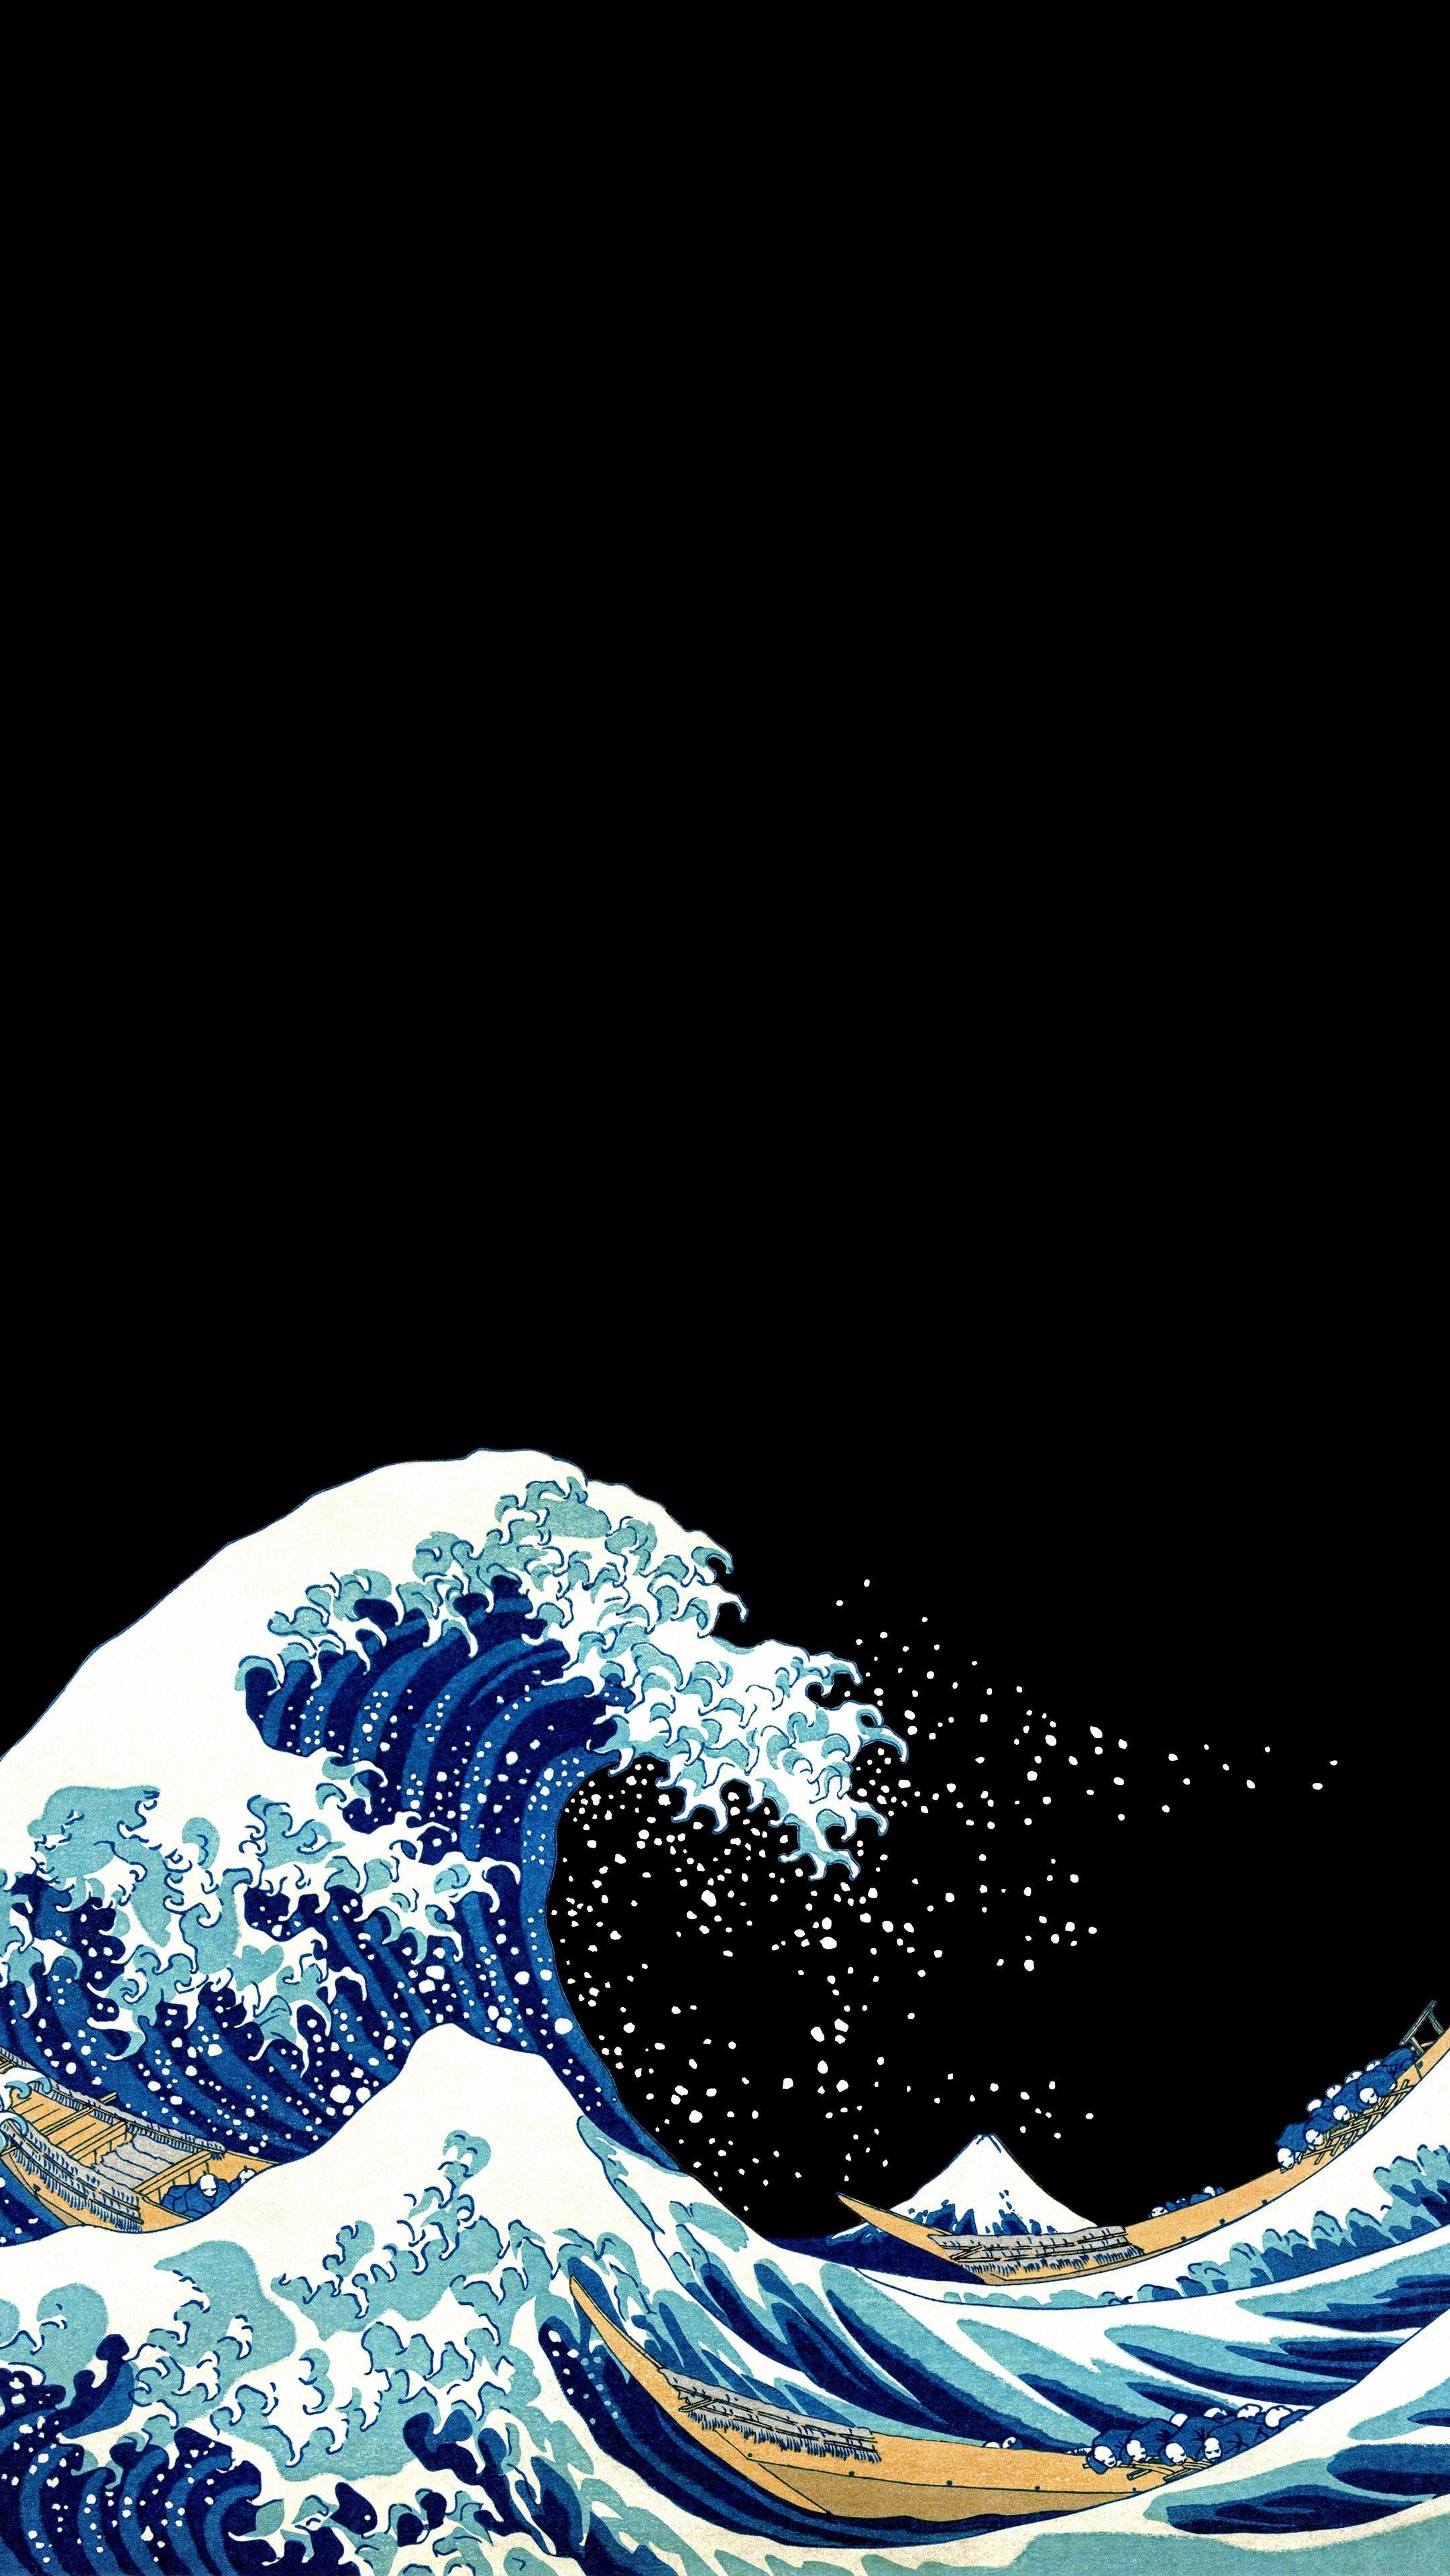 Minimalist Aesthetic Wave Wallpaper